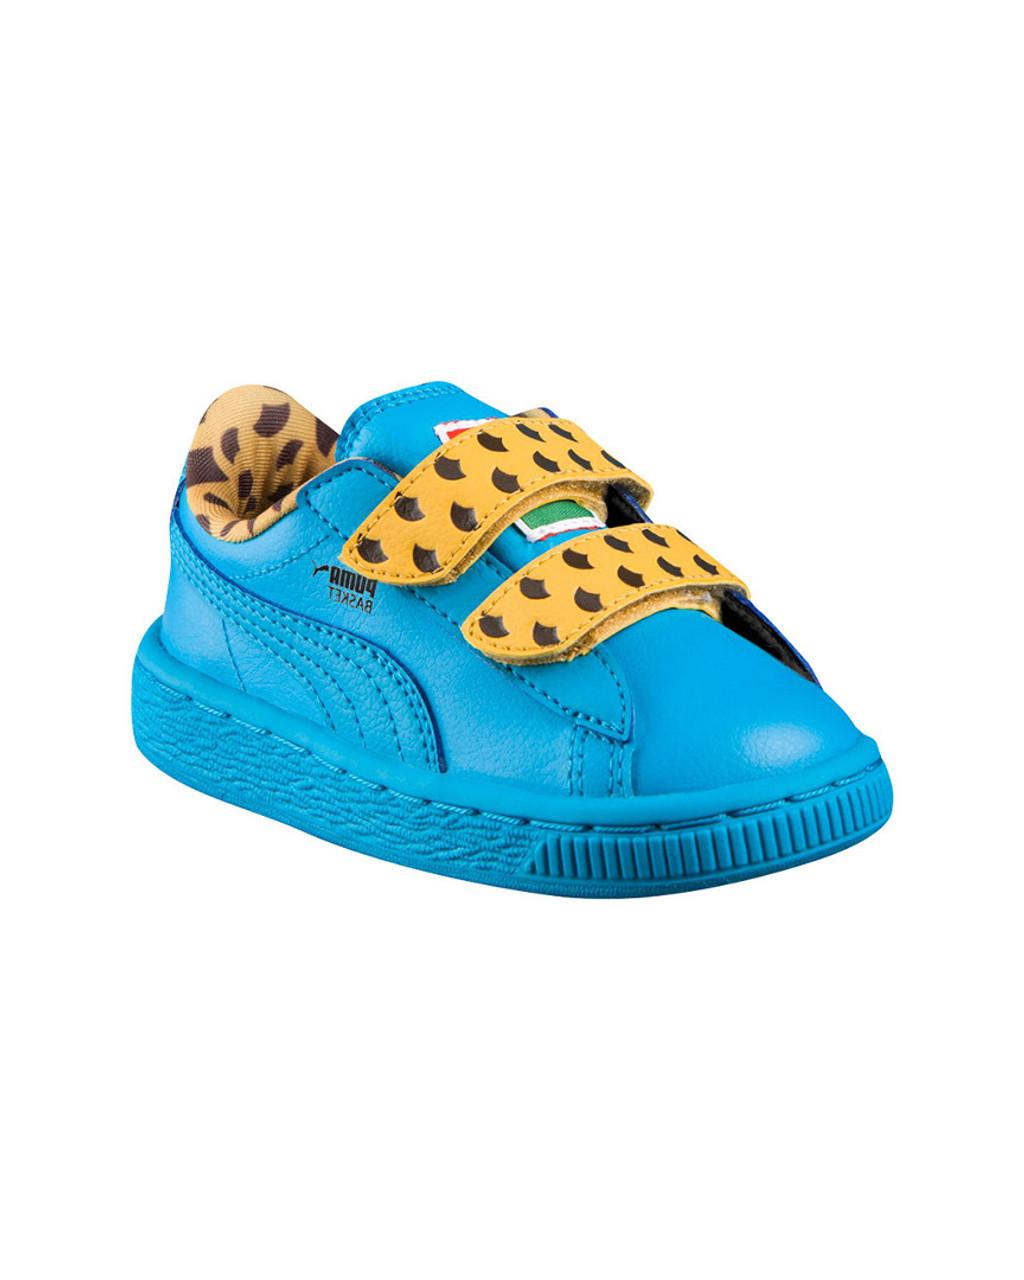 87483bfa Puma Sneaker Sesame Street Basket Cookie Monster Mono V PS Low-Top  Sneaker~1511801960